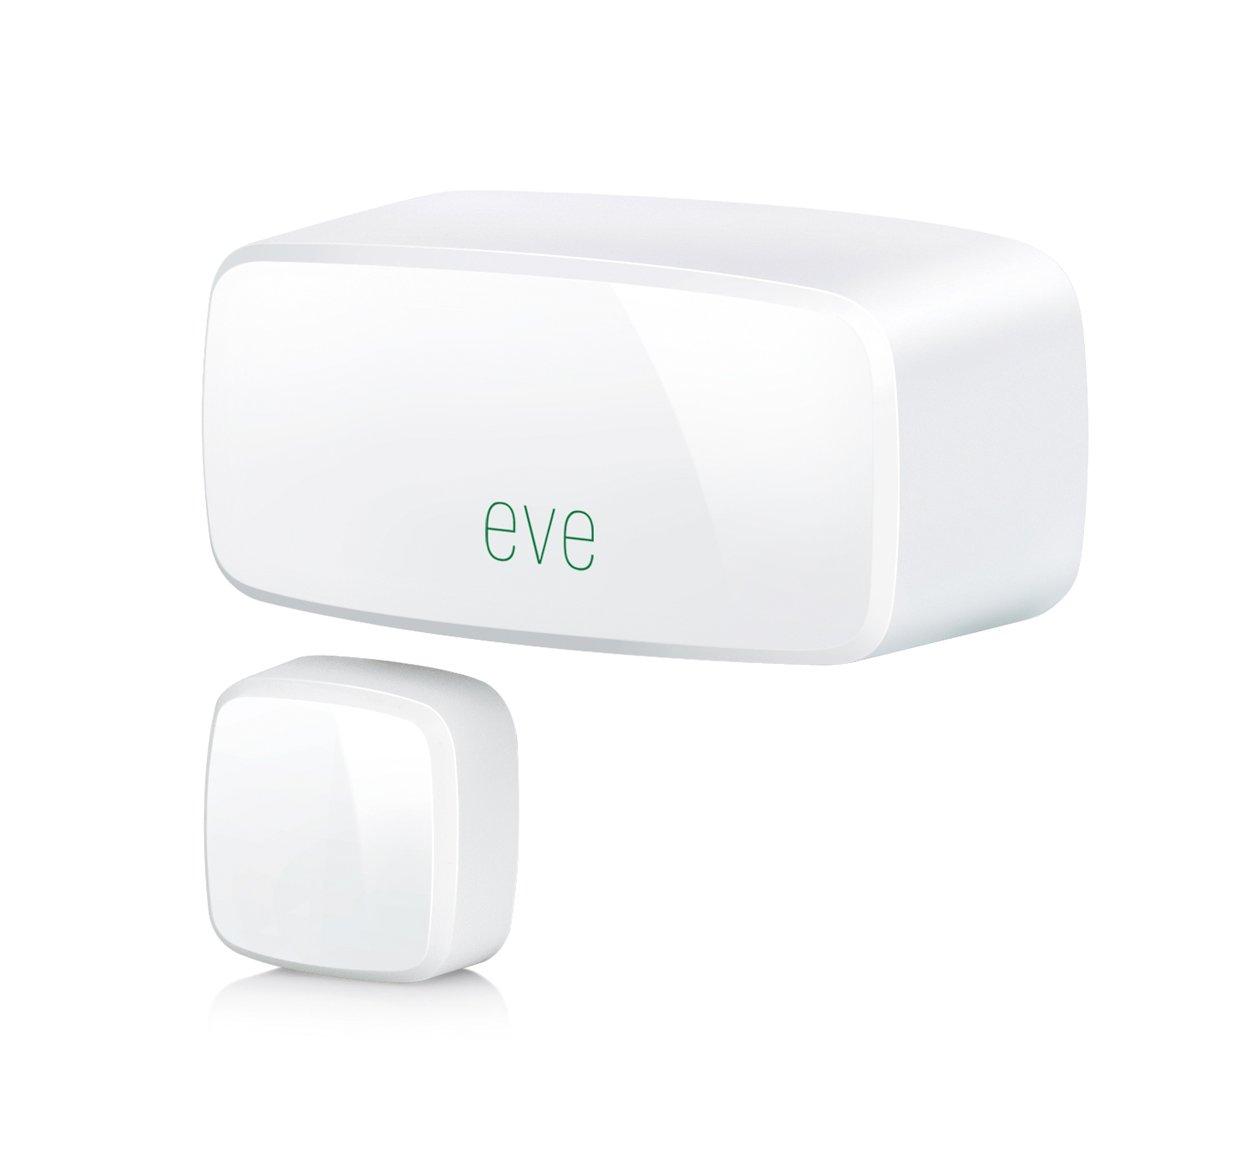 Elgato Eve Door & Window (1st Generation) - Wireless Contact Sensor with Apple HomeKit technology, Bluetooth Low Energy by Elgato (Image #2)